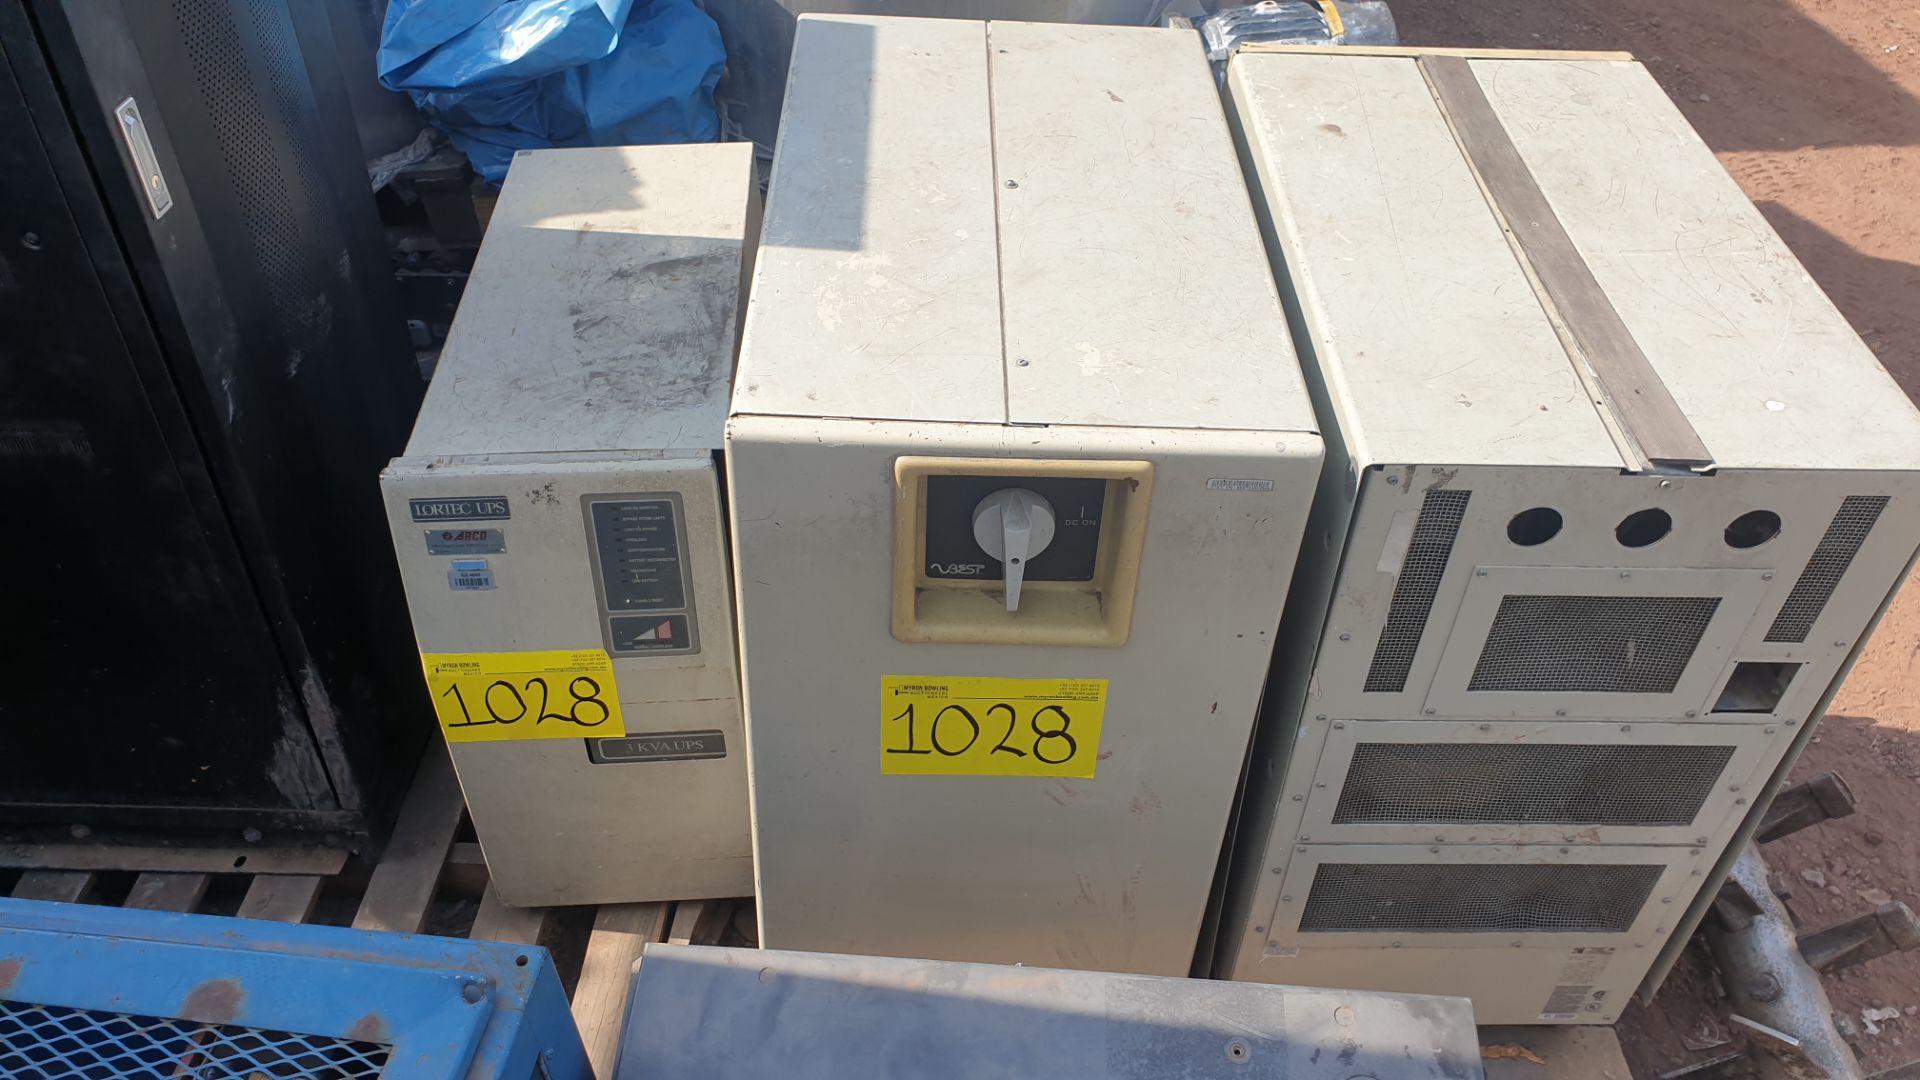 1 Ferrups Power bank system model FD10KVA 208-240V includes Lortec UPS of 3KVA - Image 10 of 11